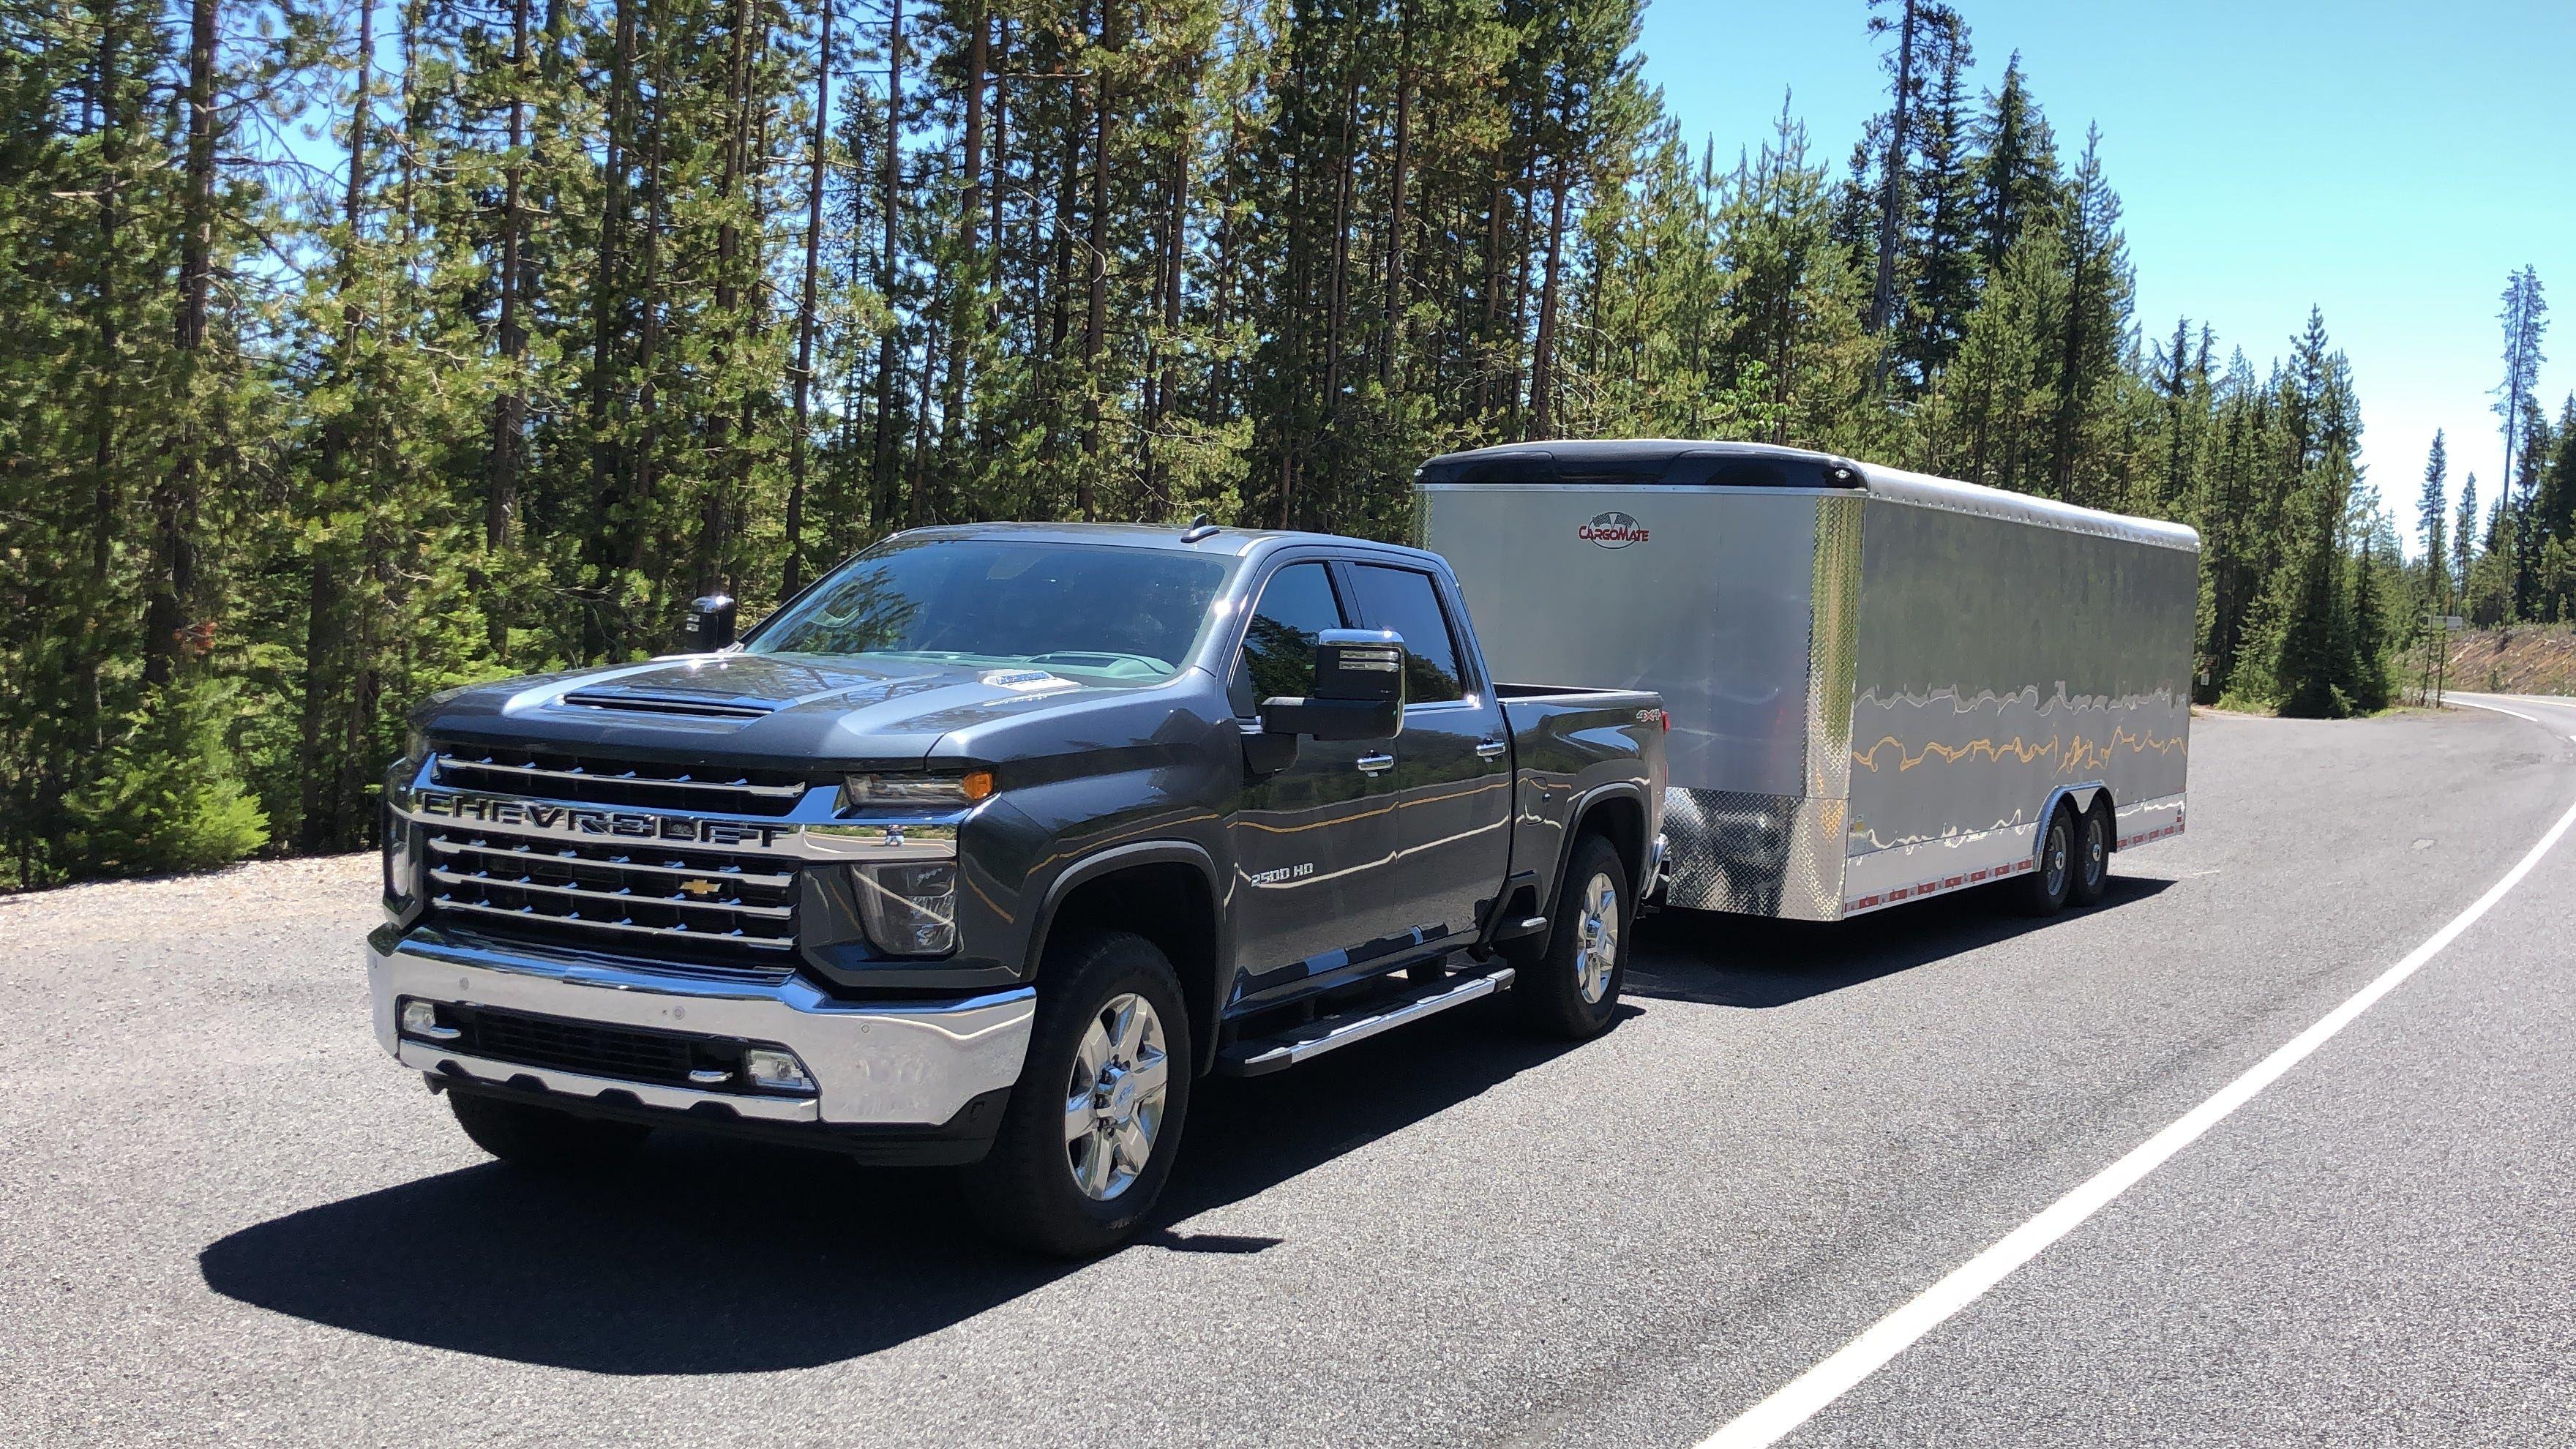 2019 Ram 1500 Pickup trucks for sale, New cars for sale